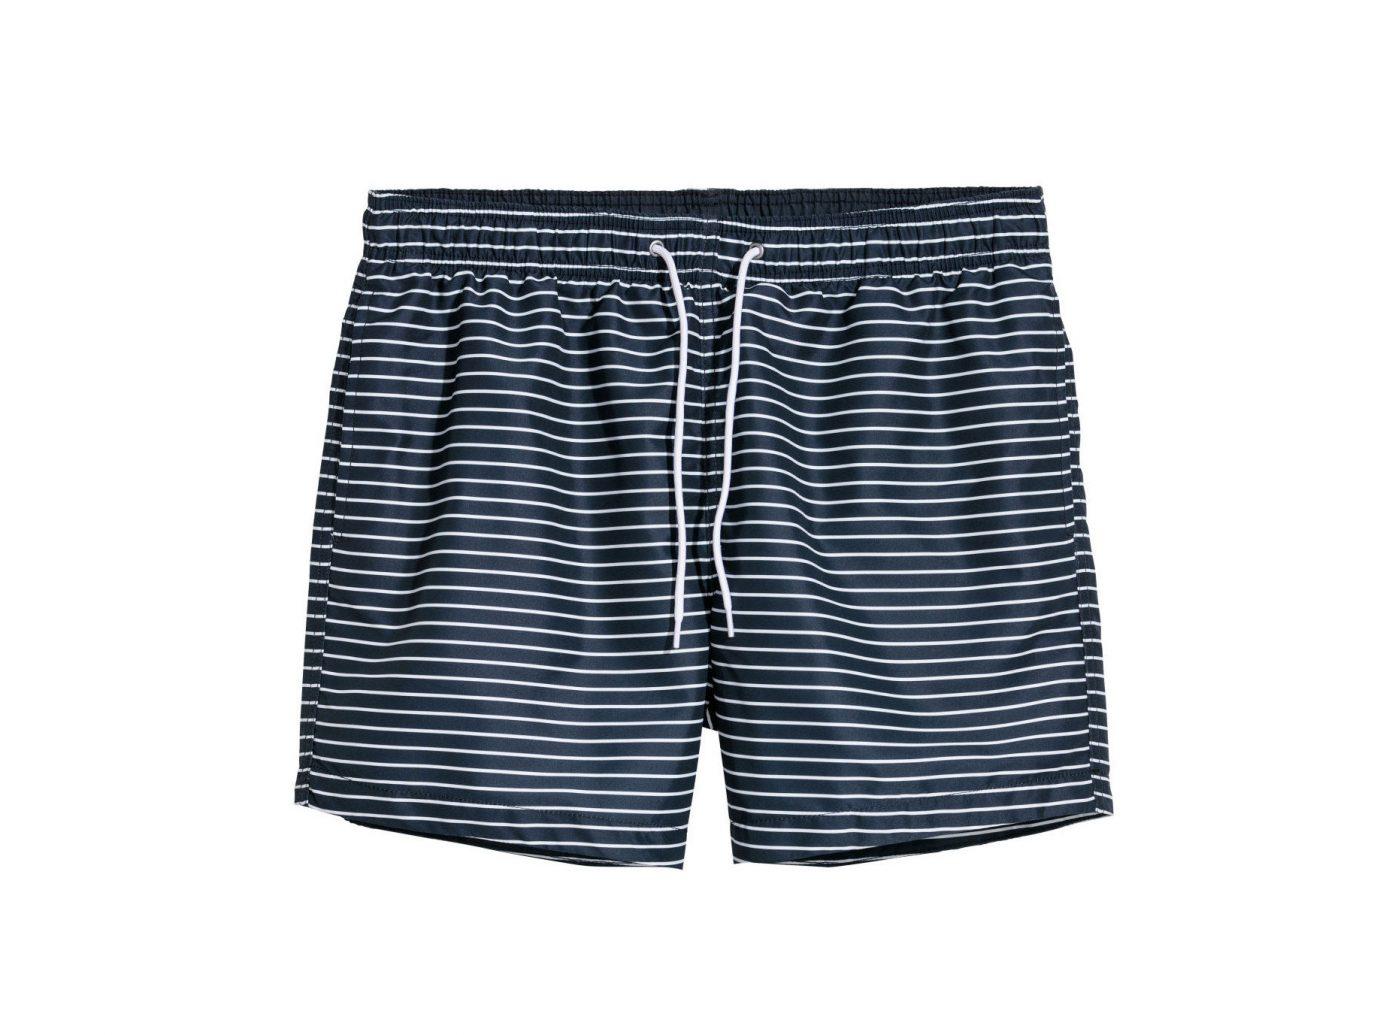 Beach Spring Travel Style + Design Summer Travel Travel Shop active shorts shorts trunks bermuda shorts briefs underpants product waist swim brief undergarment active undergarment